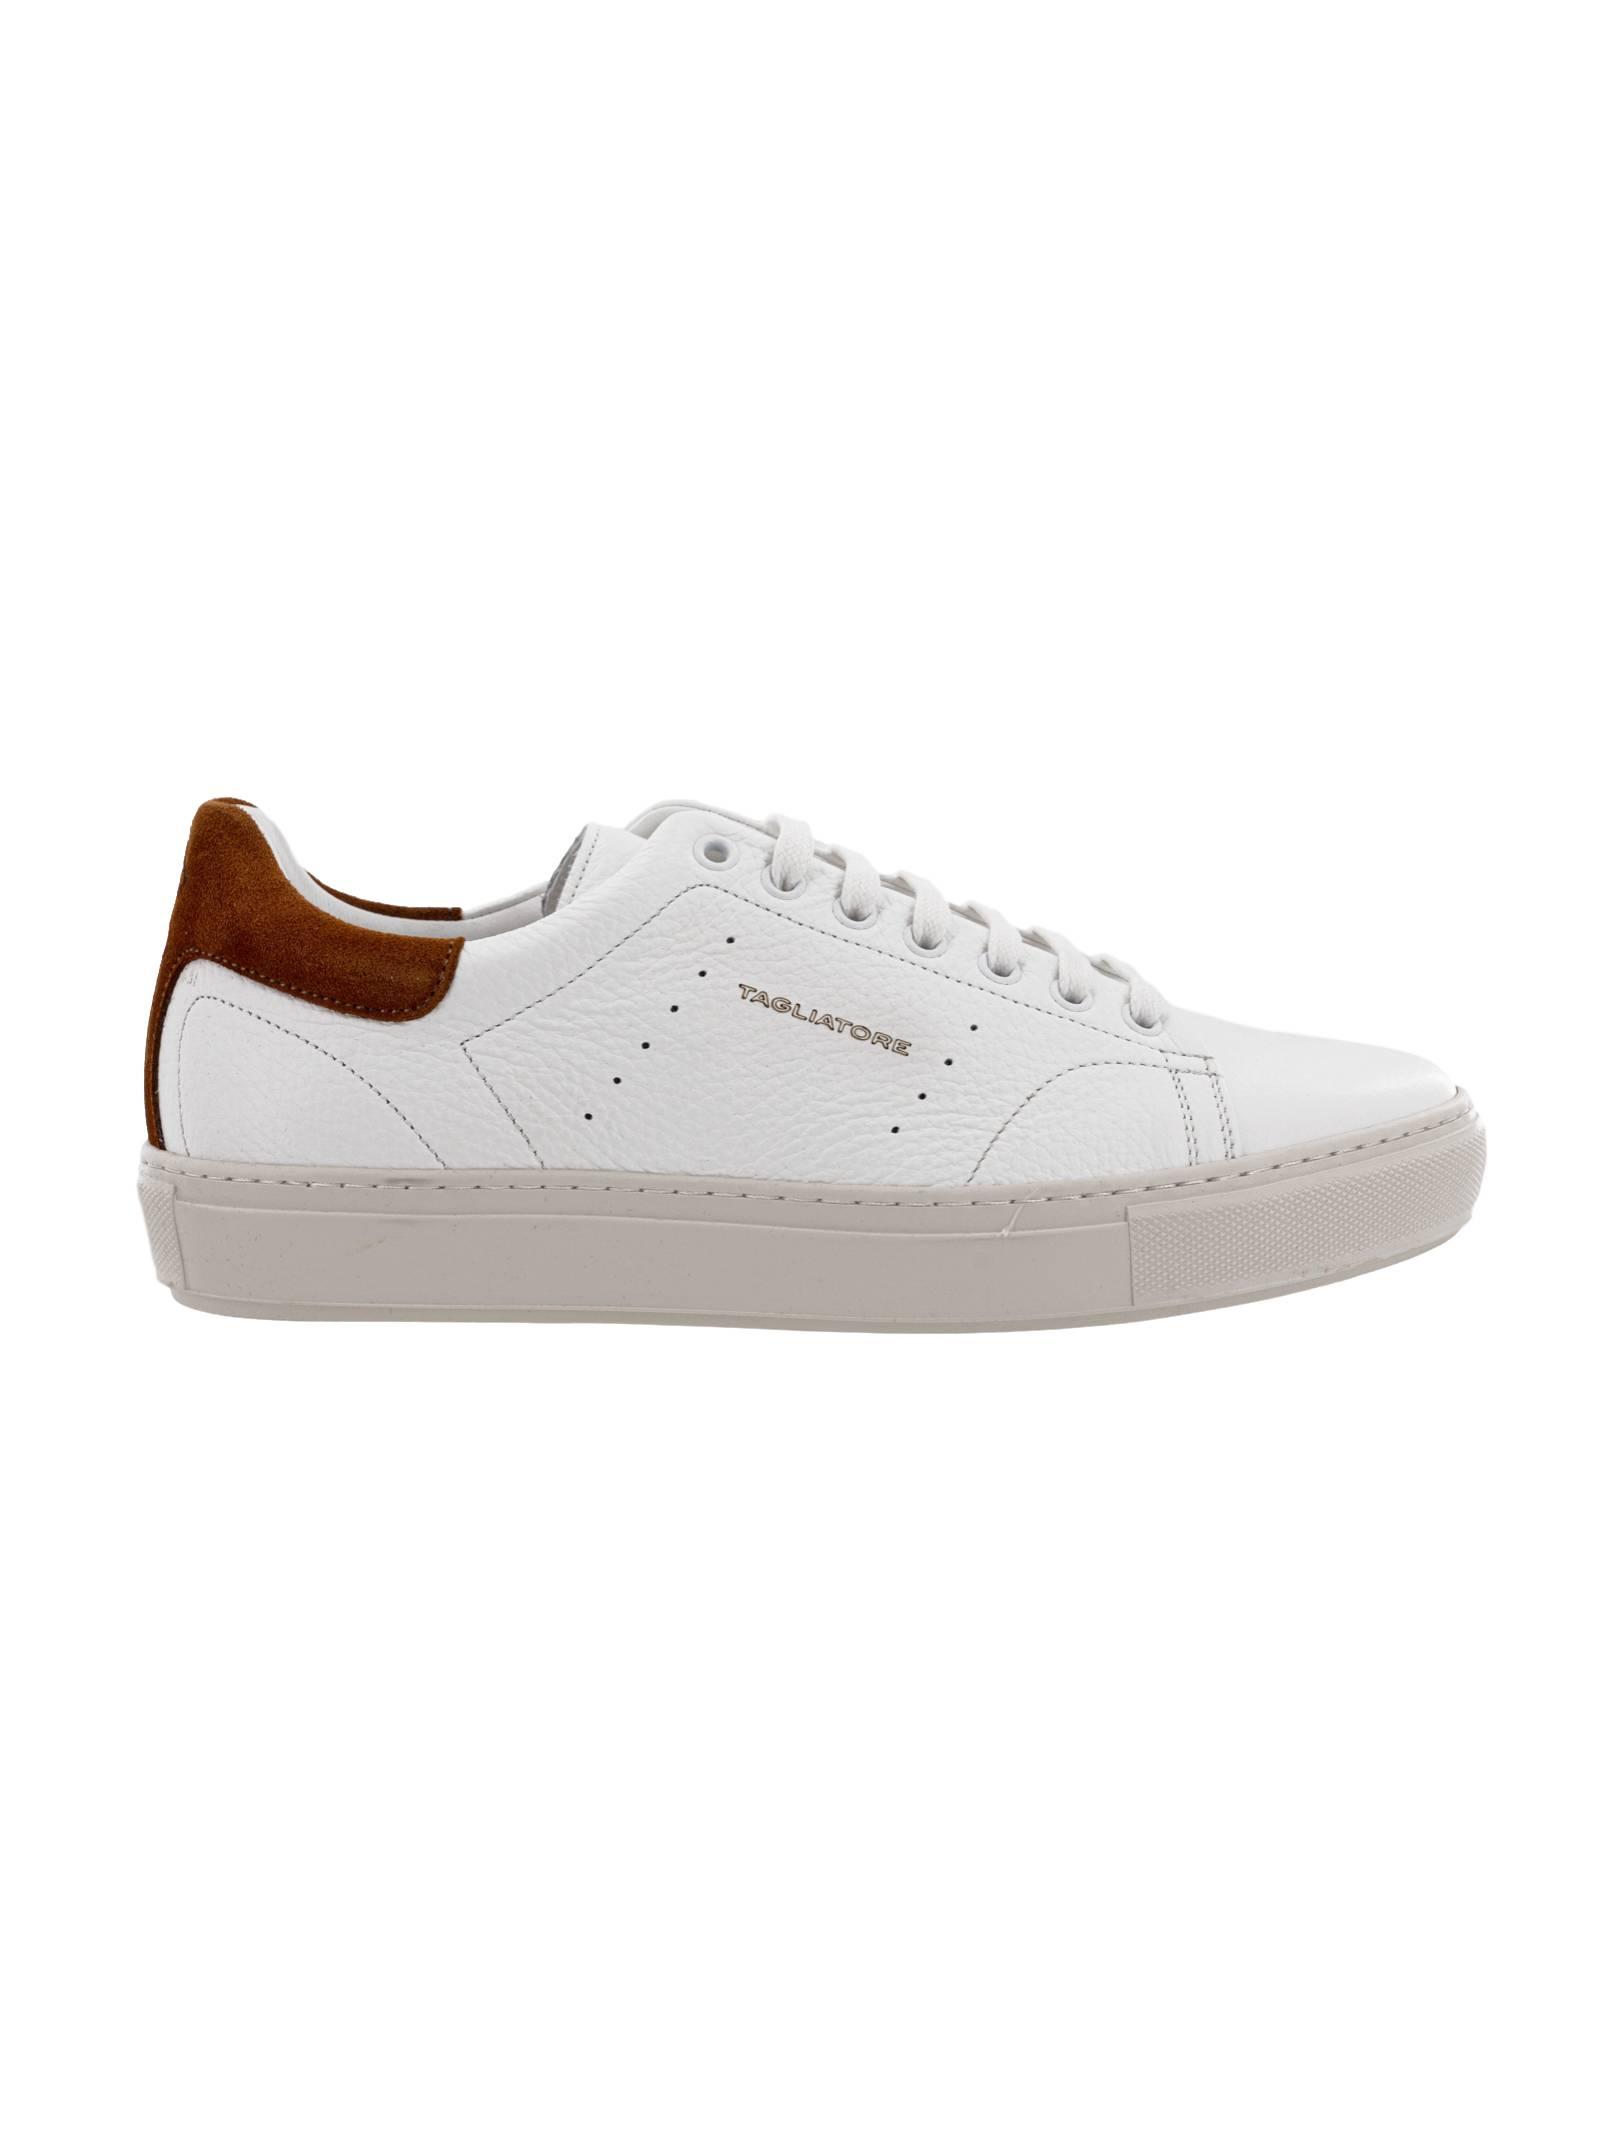 Sneakers Tagliatore TAGLIATORE   5032295   DWIGHTBIANCO